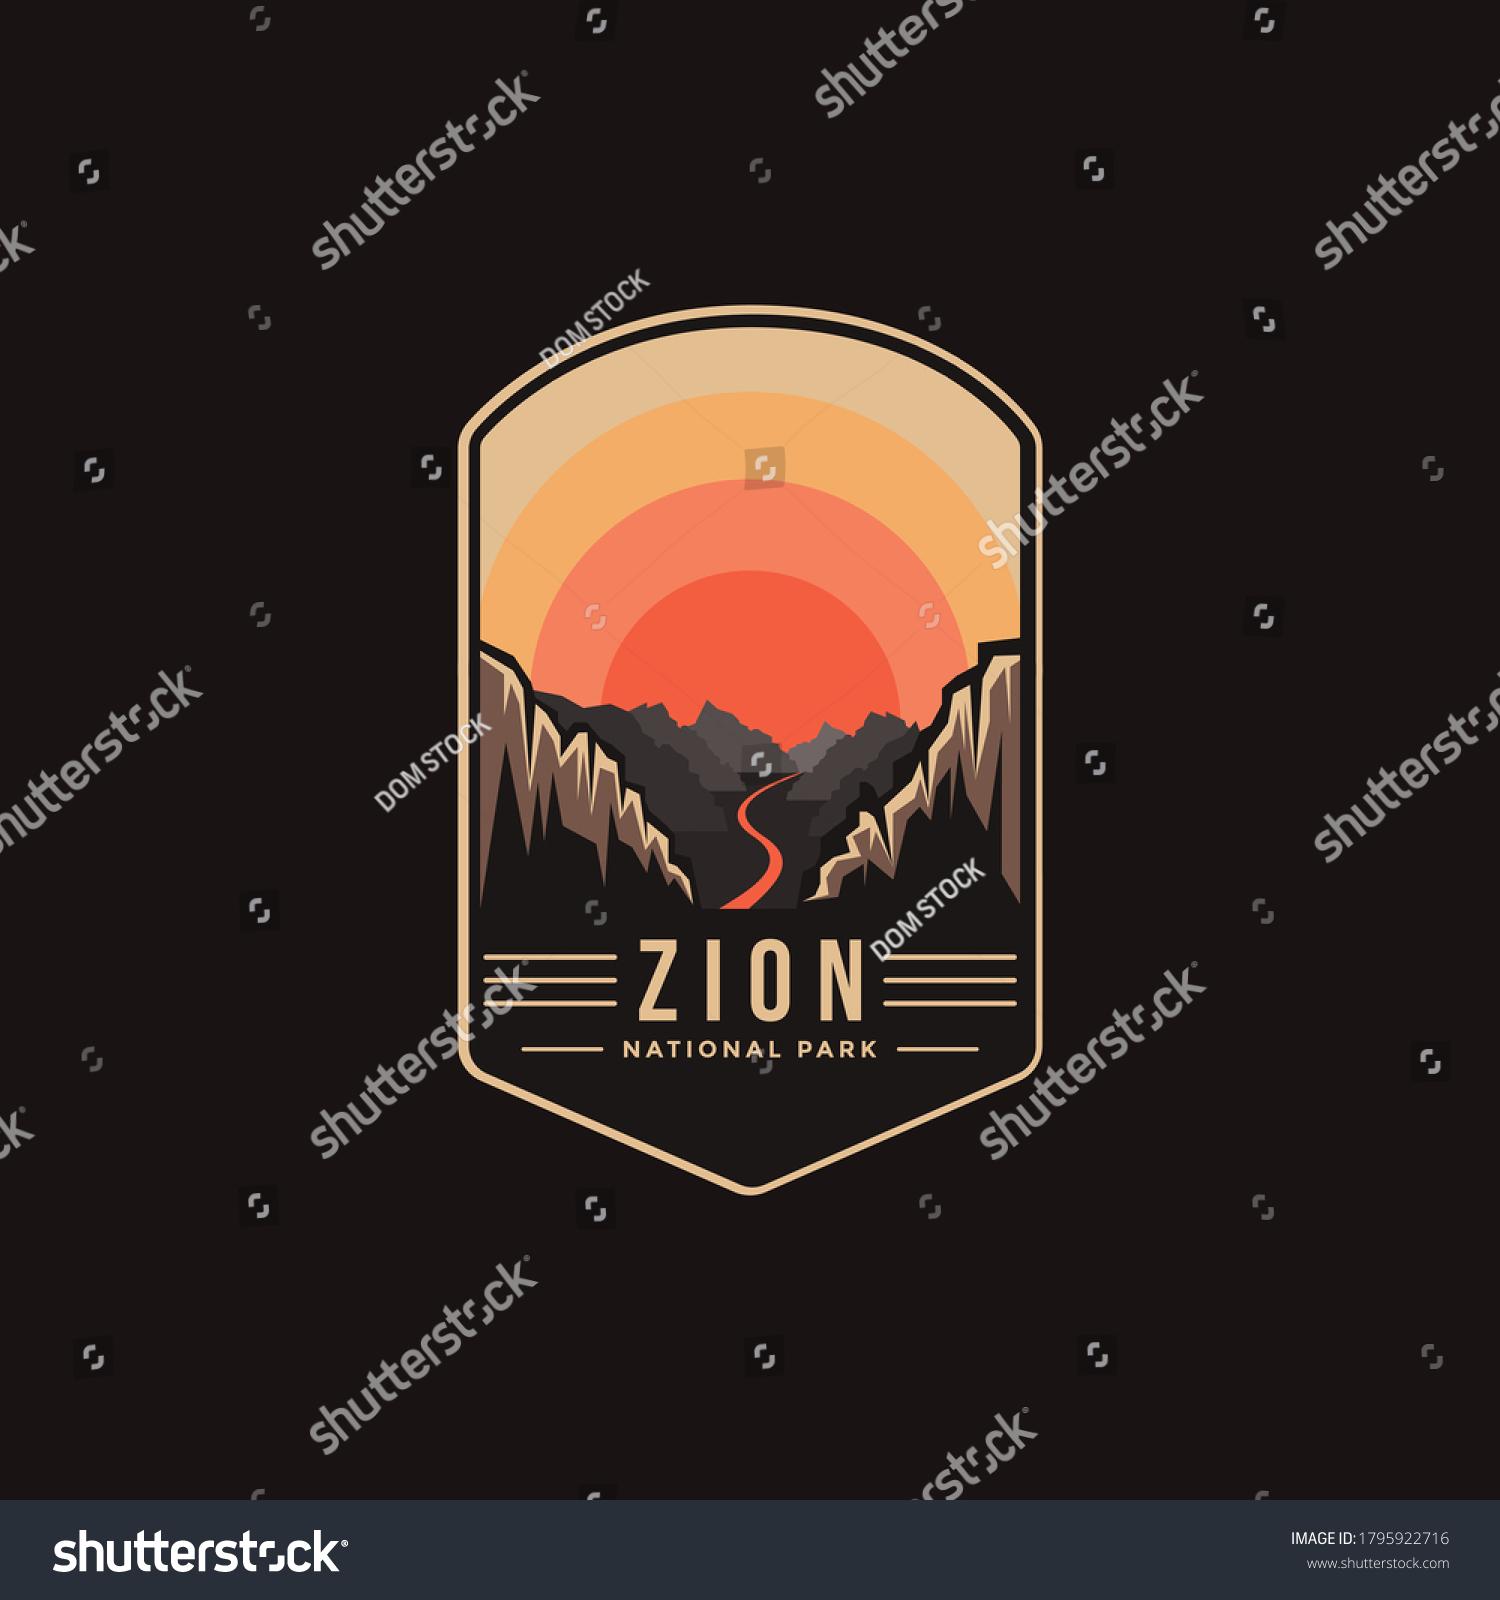 Emblem patch logo illustration of Zion National Park on dark background #1795922716